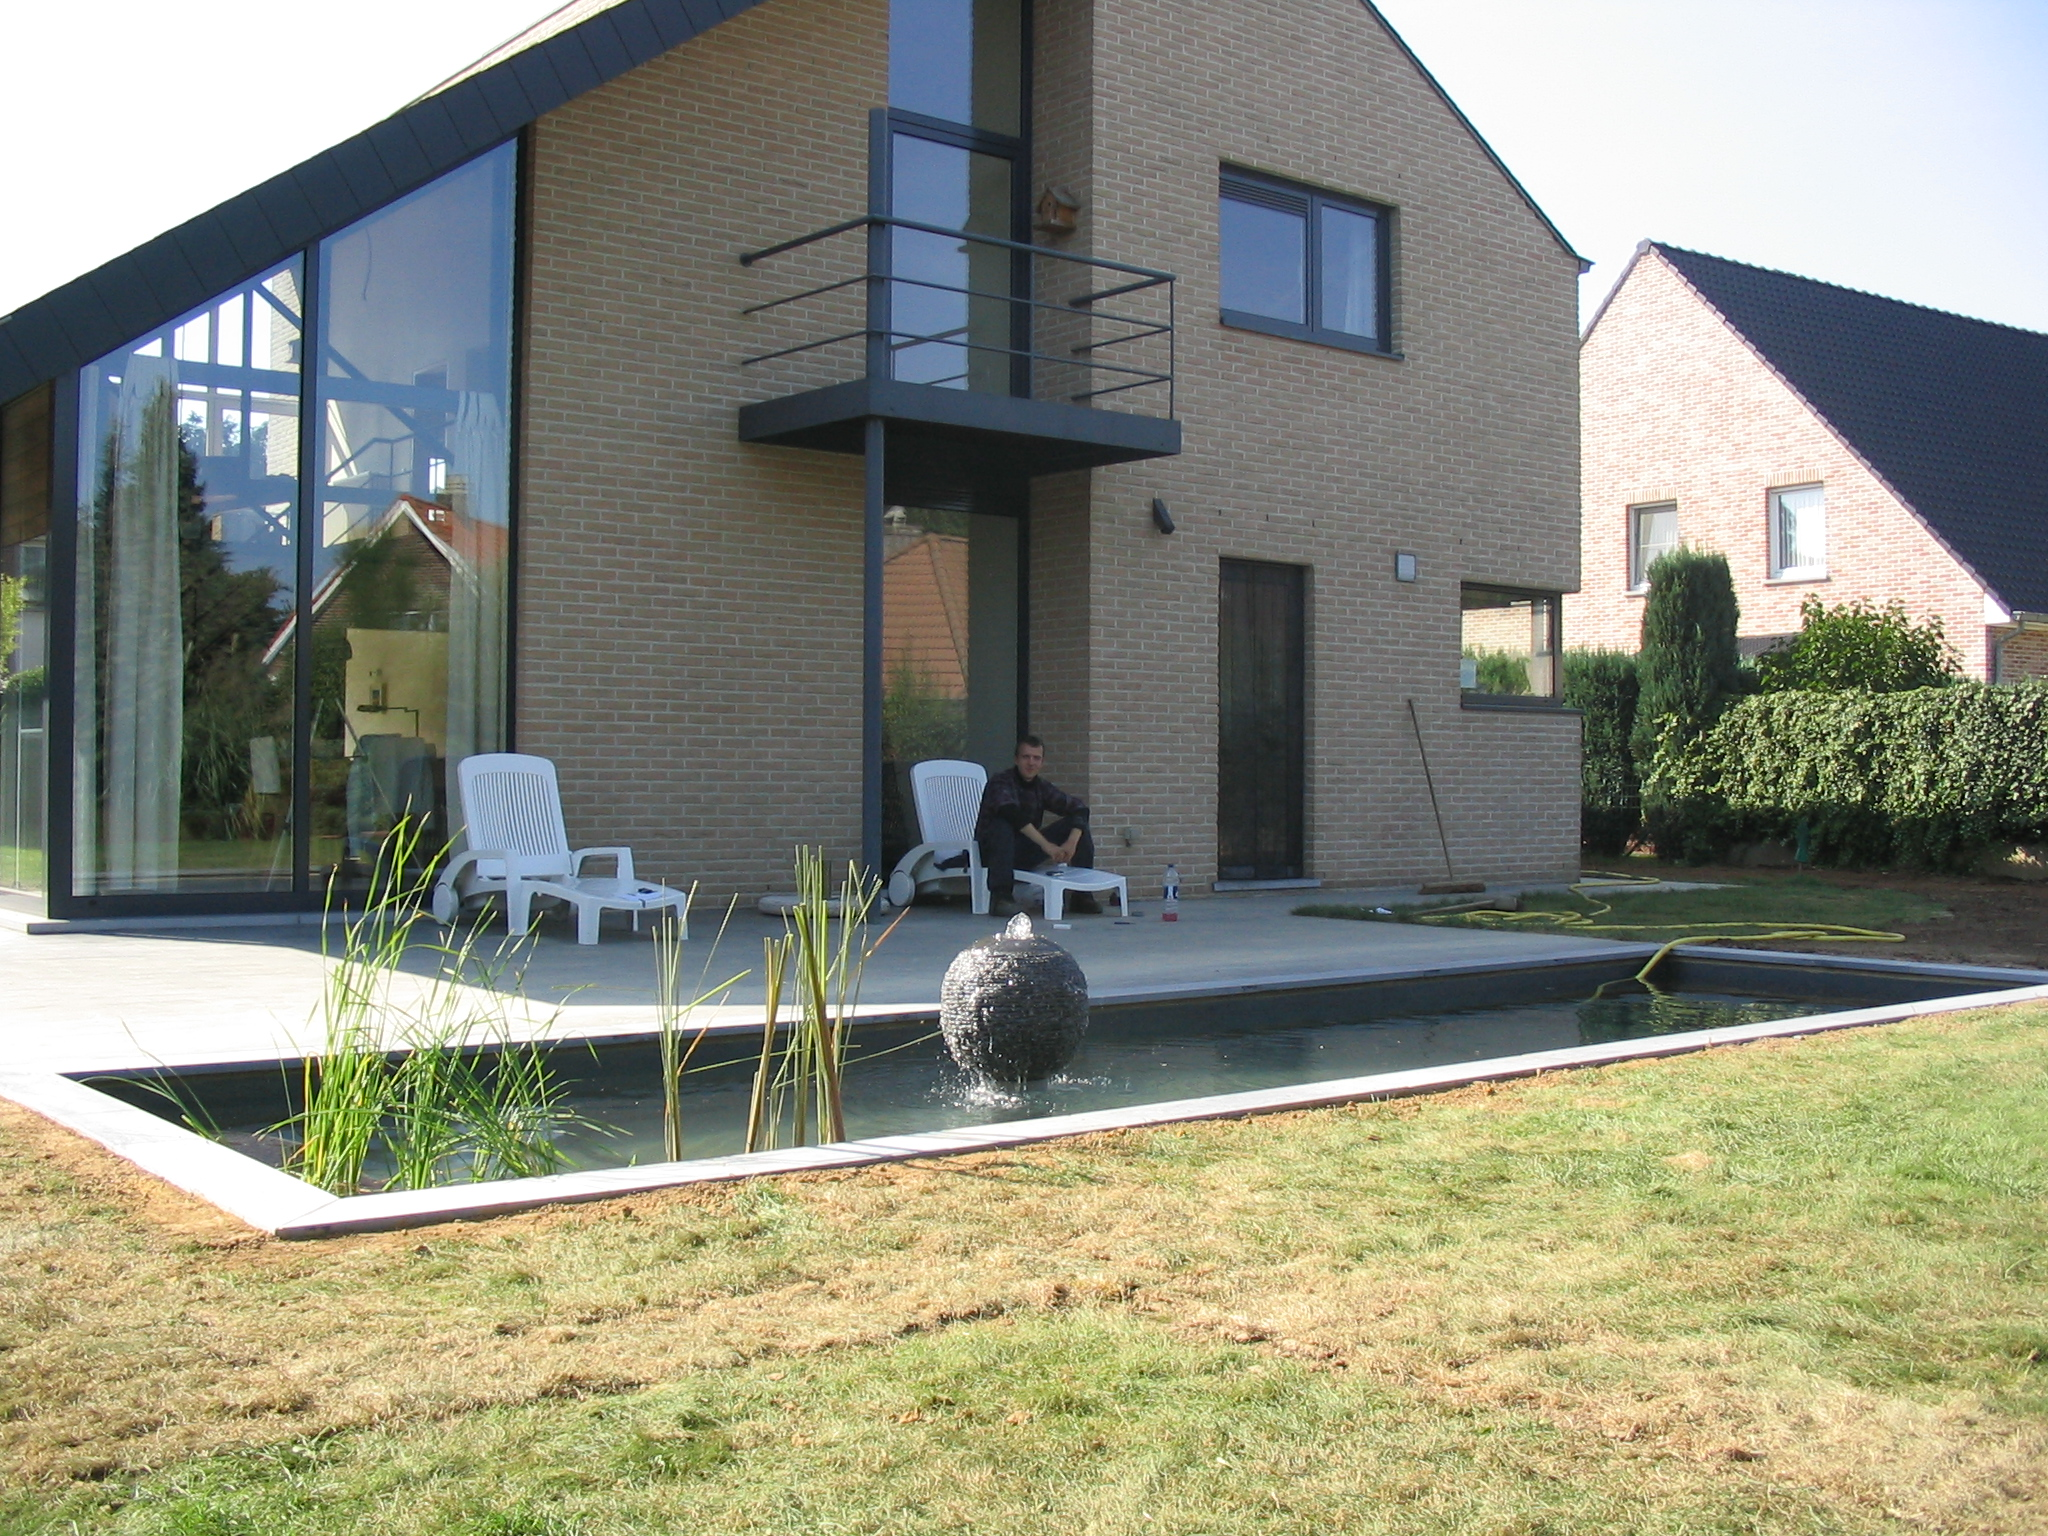 Bassin de jardin belgique bassin de jardin for Vente koi belgique